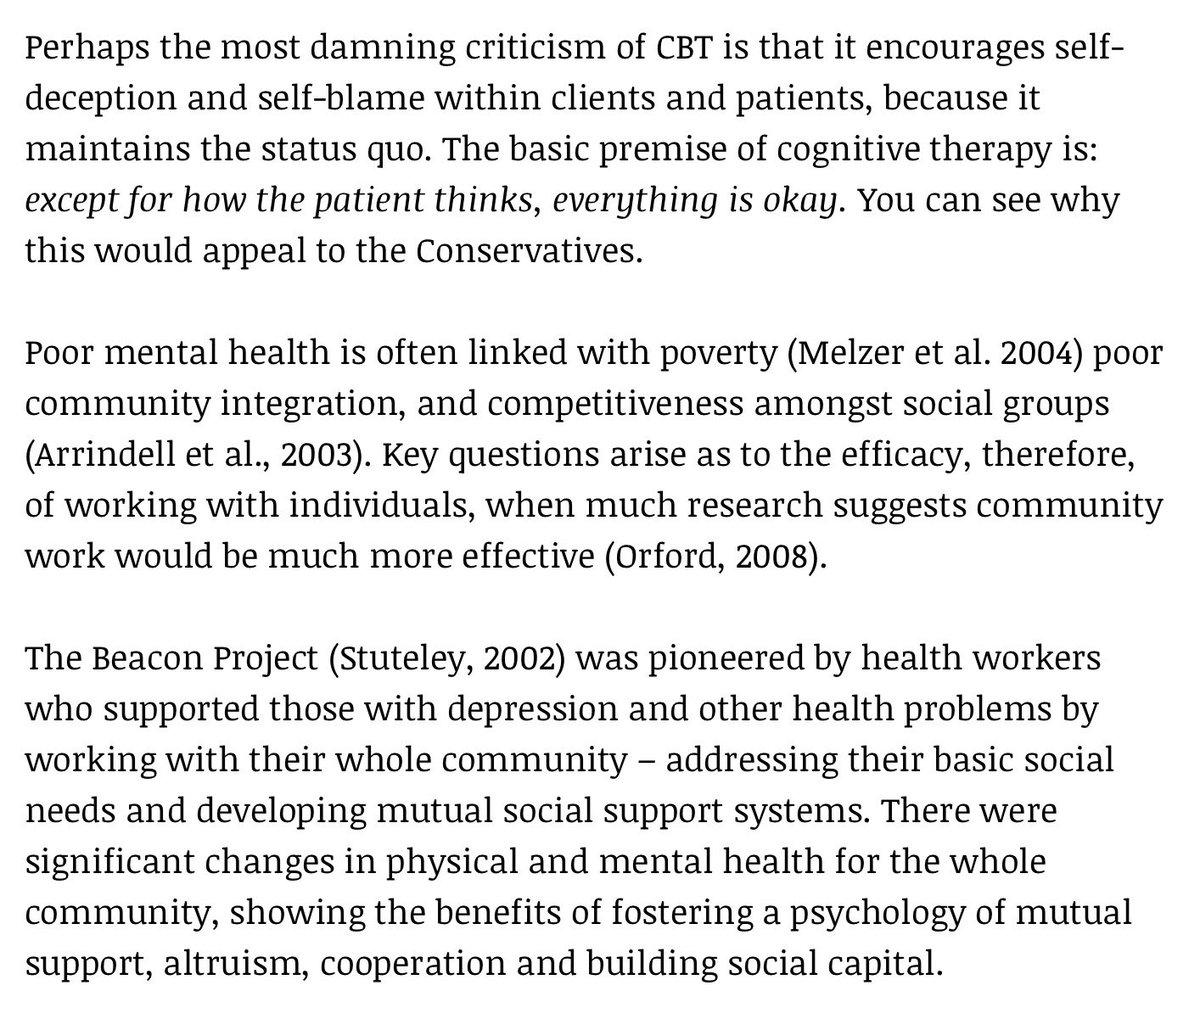 Nicky Lambert On Twitter Strong Words Misuse Of CBT Positive Thinking Is Political Gas Lighting TY KittySJones Tco KvJQDUVP6U